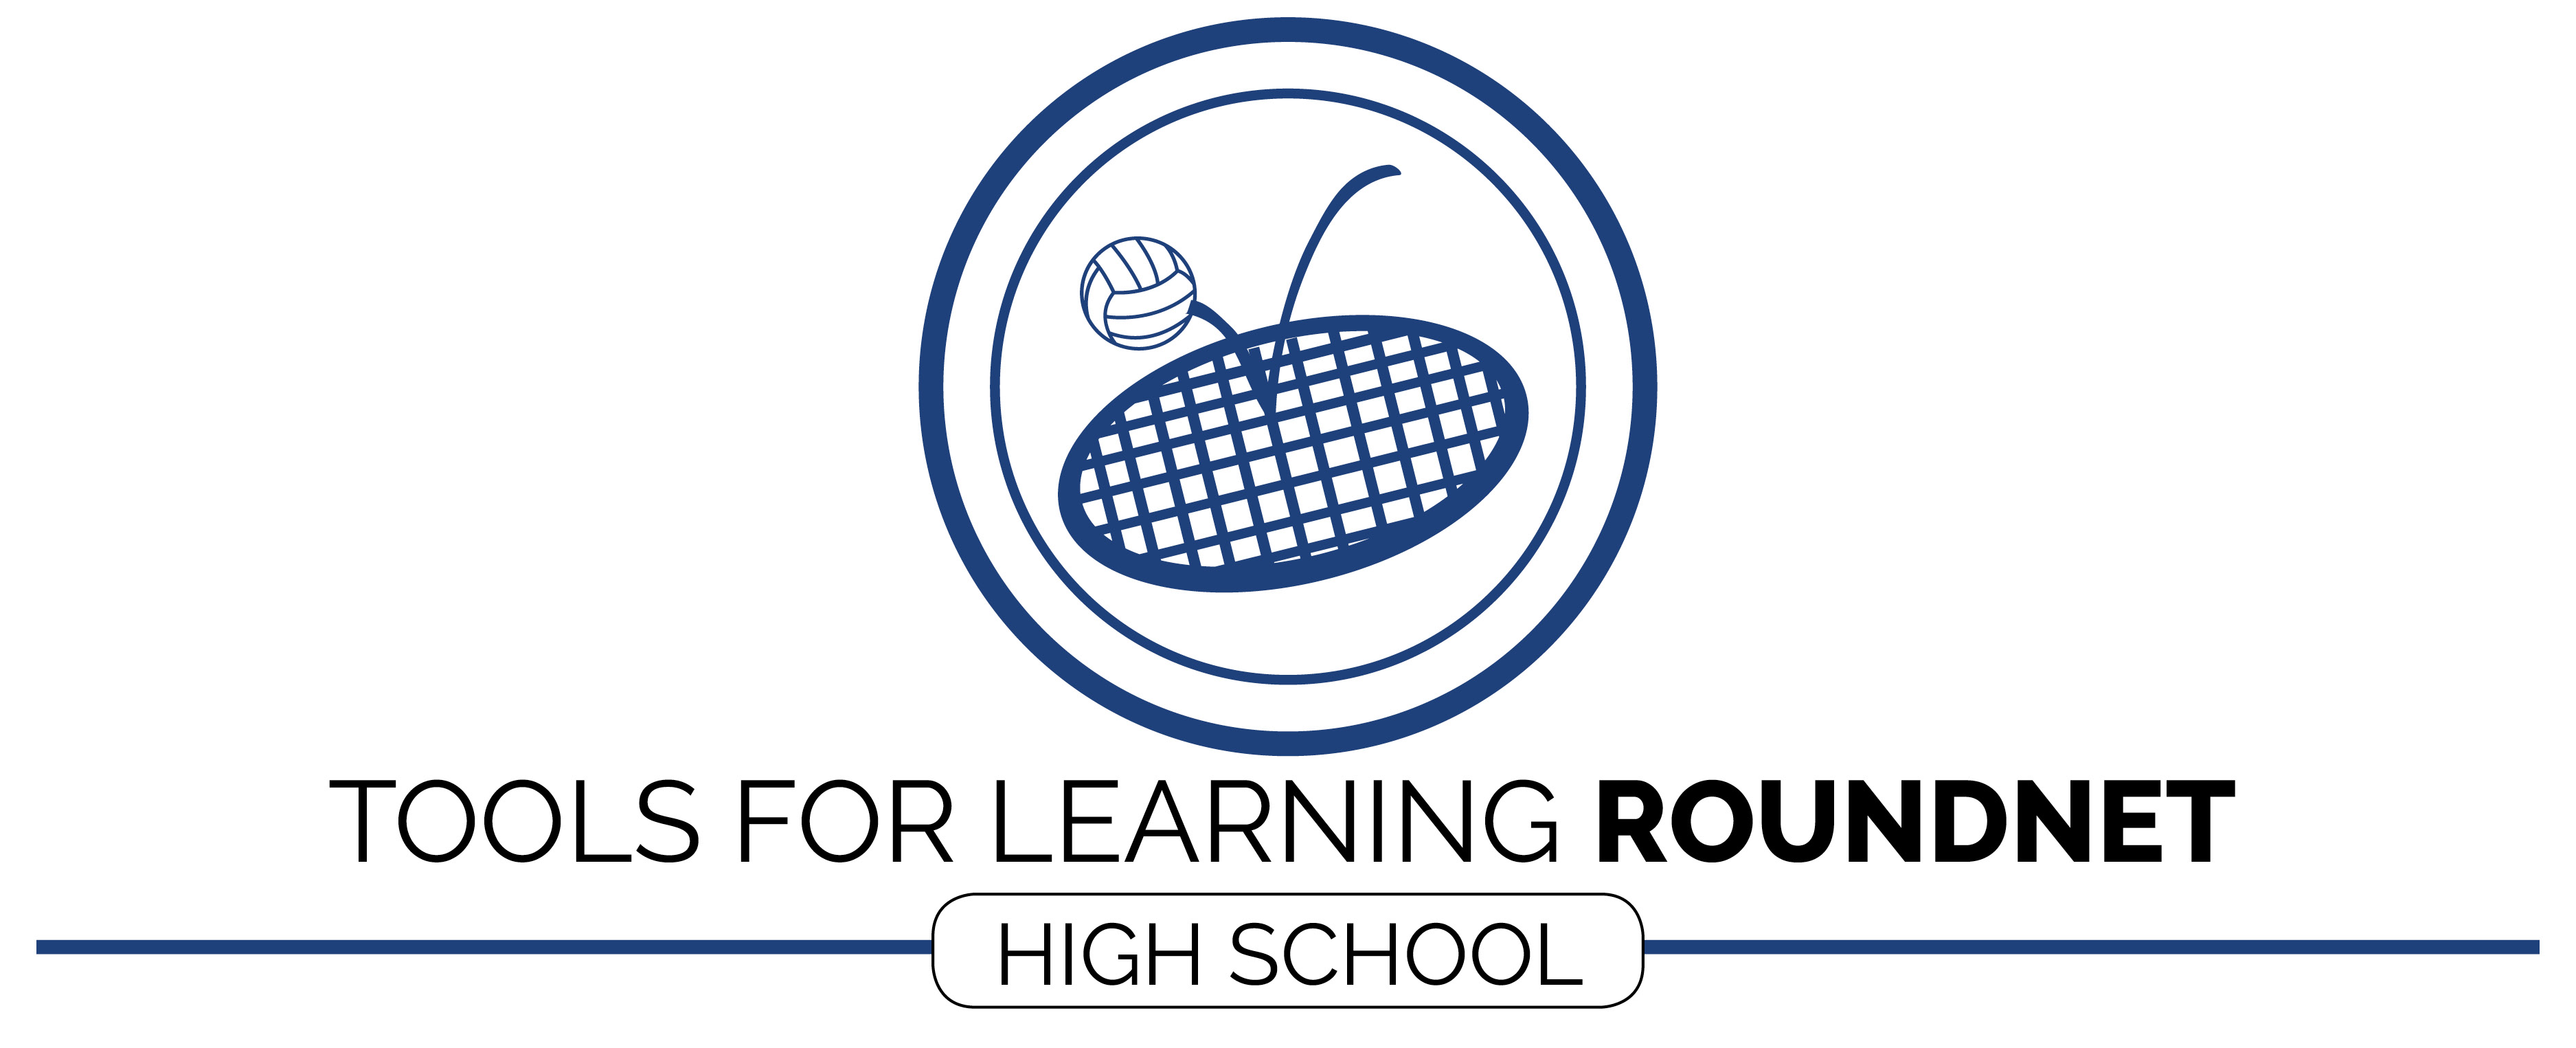 Roundnet(HS 9-12)